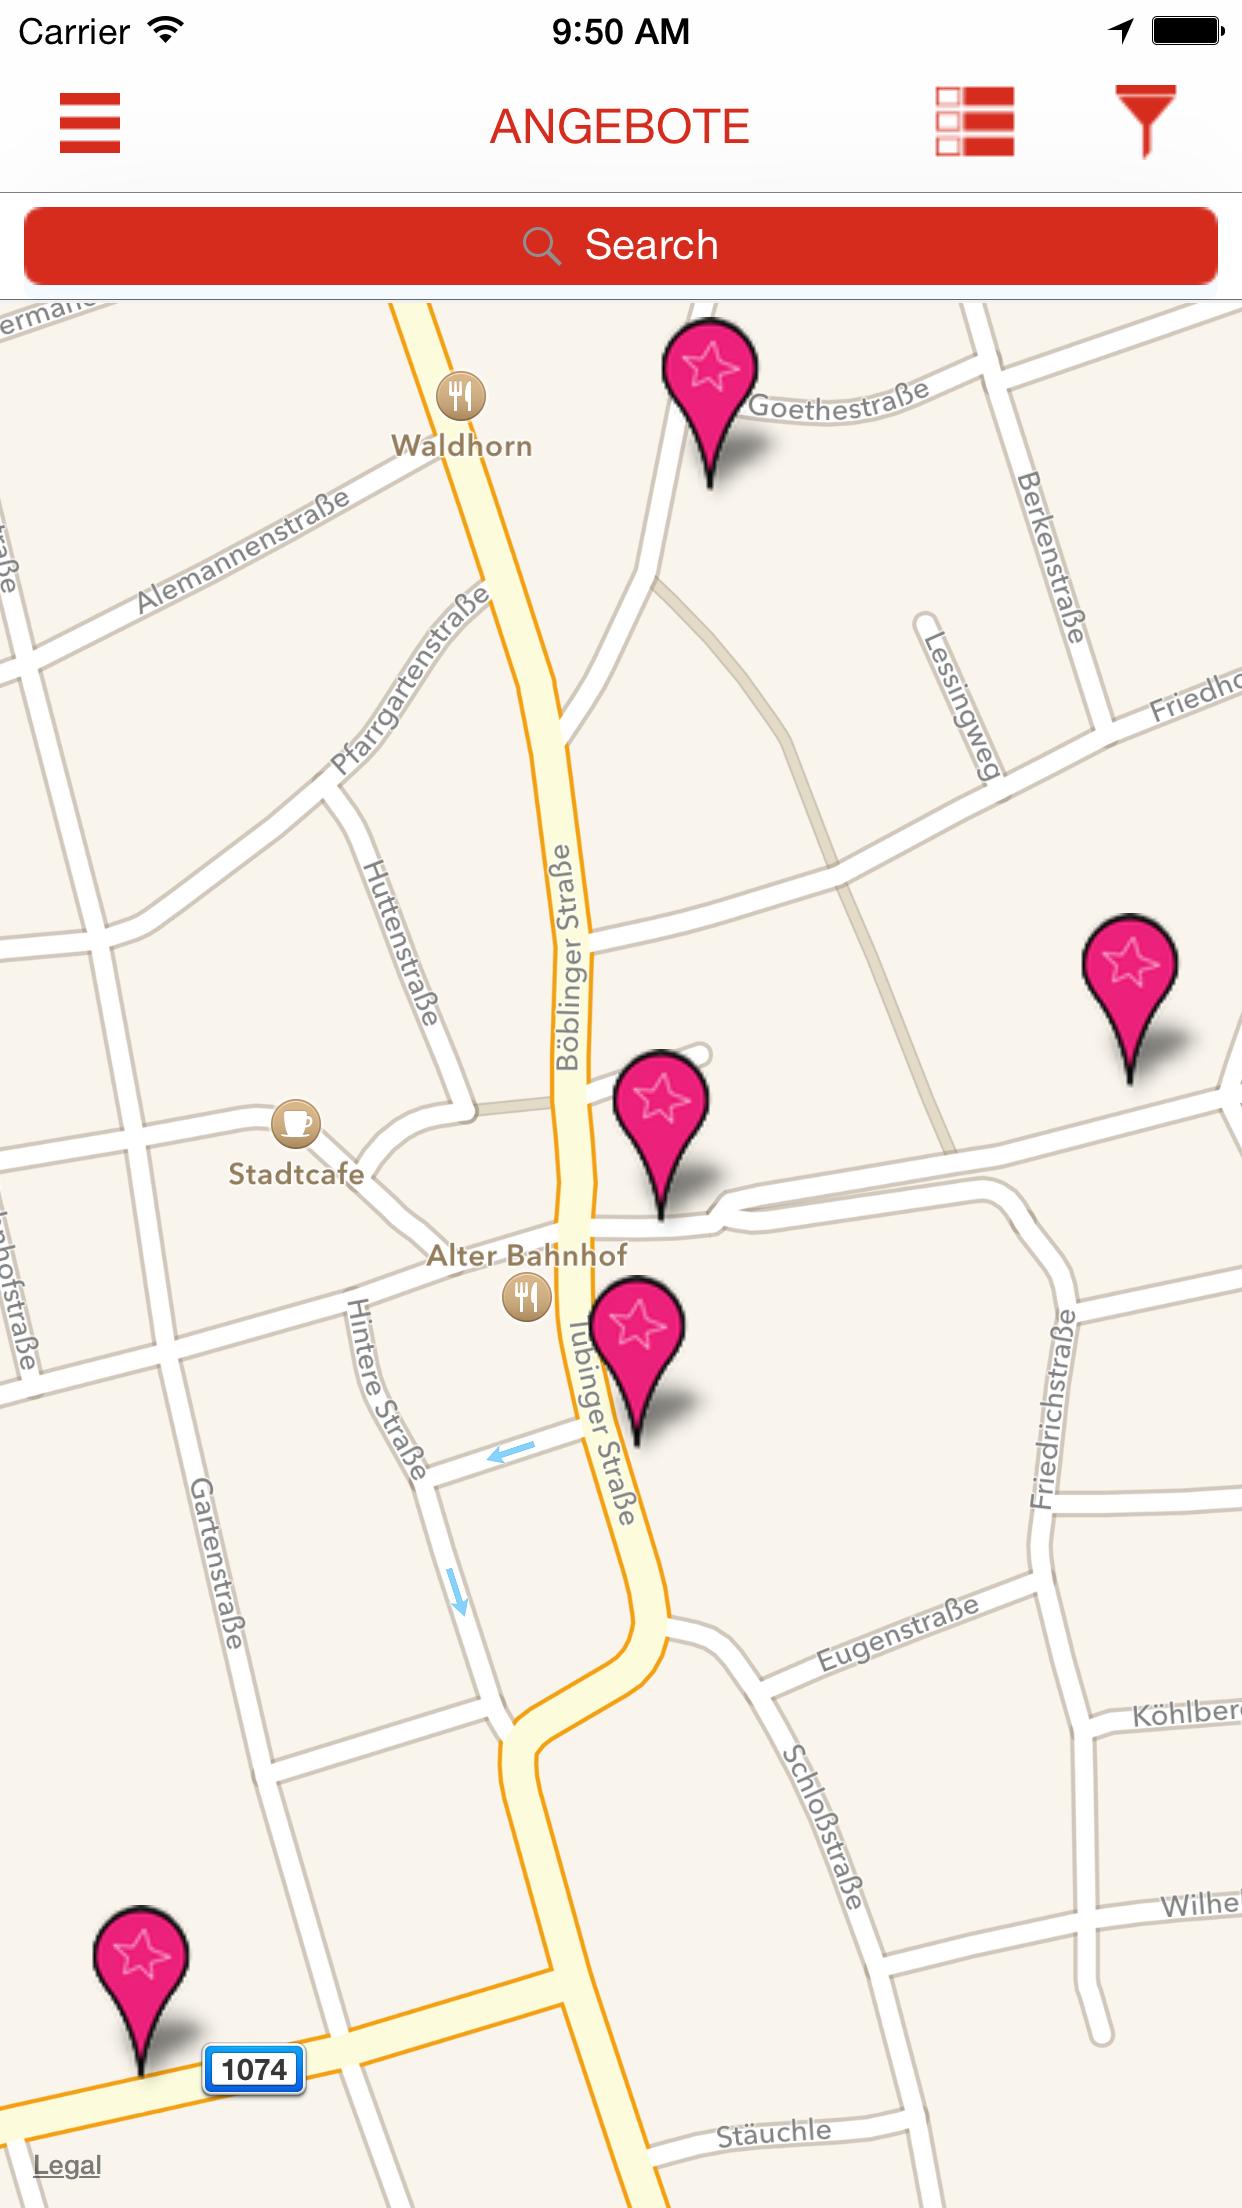 Angebote Interaktive Karte